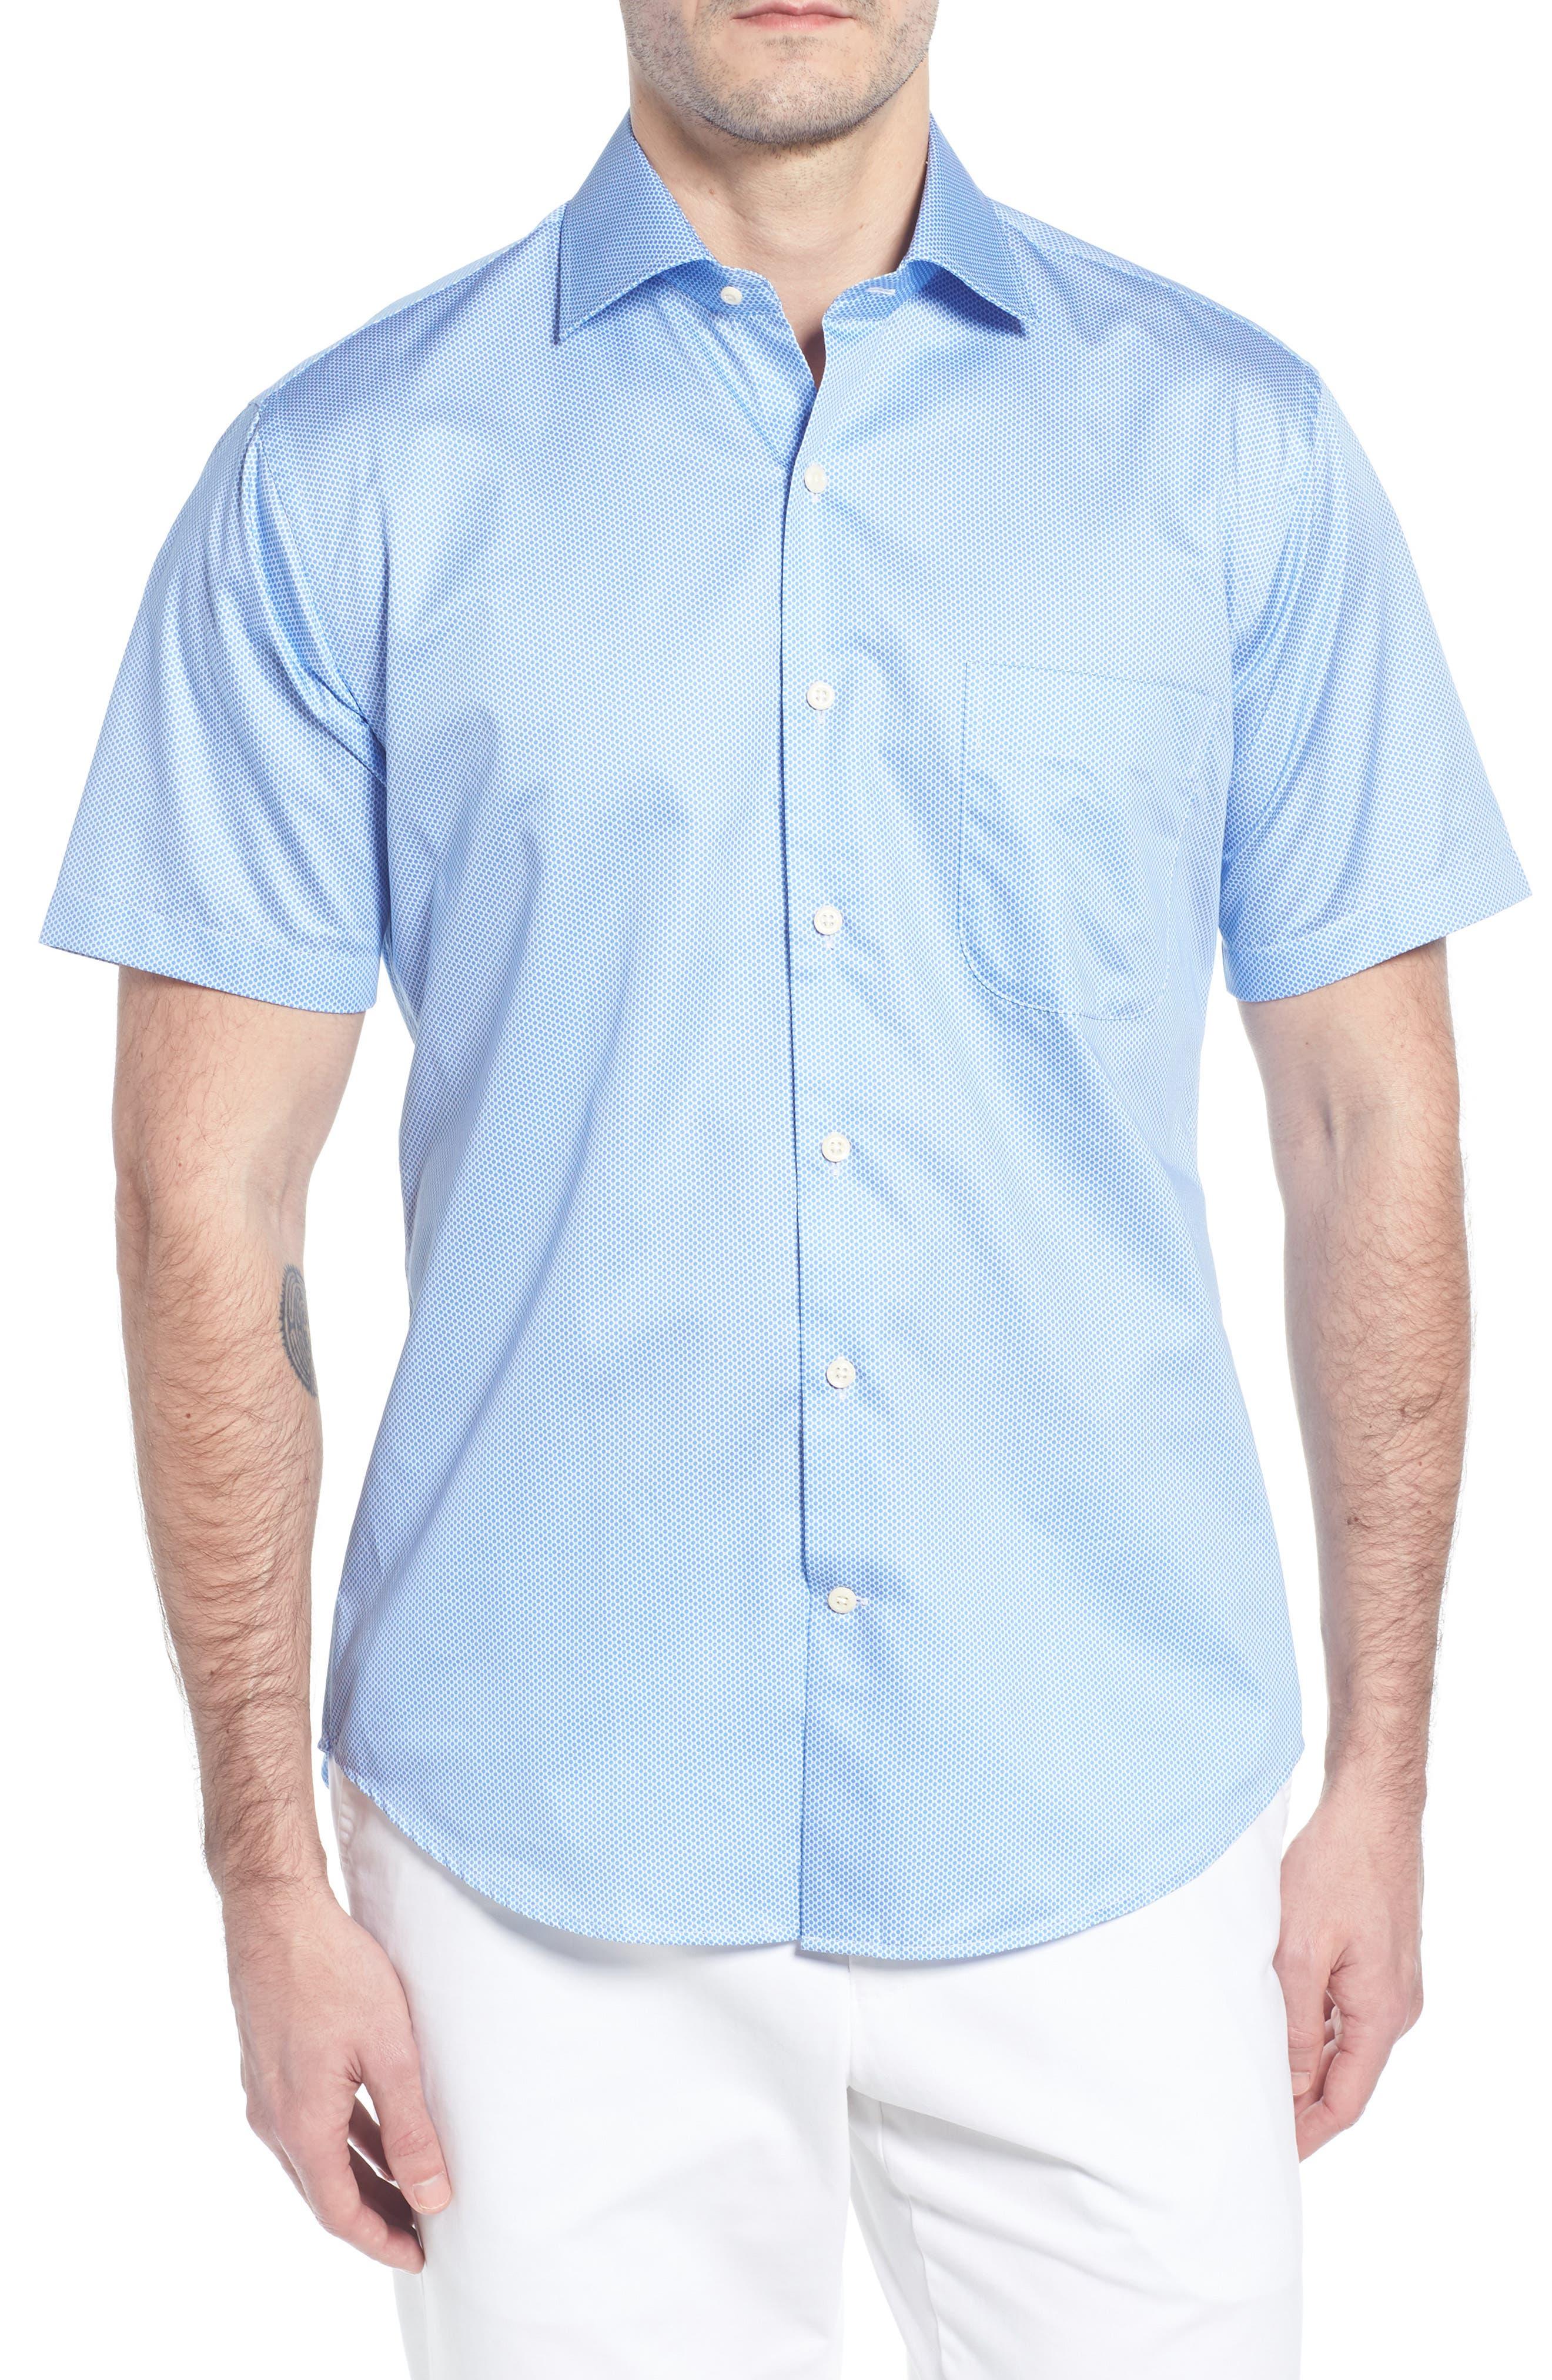 Crown Ease Connecting the Dots Sport Shirt,                         Main,                         color, Atlas Blue